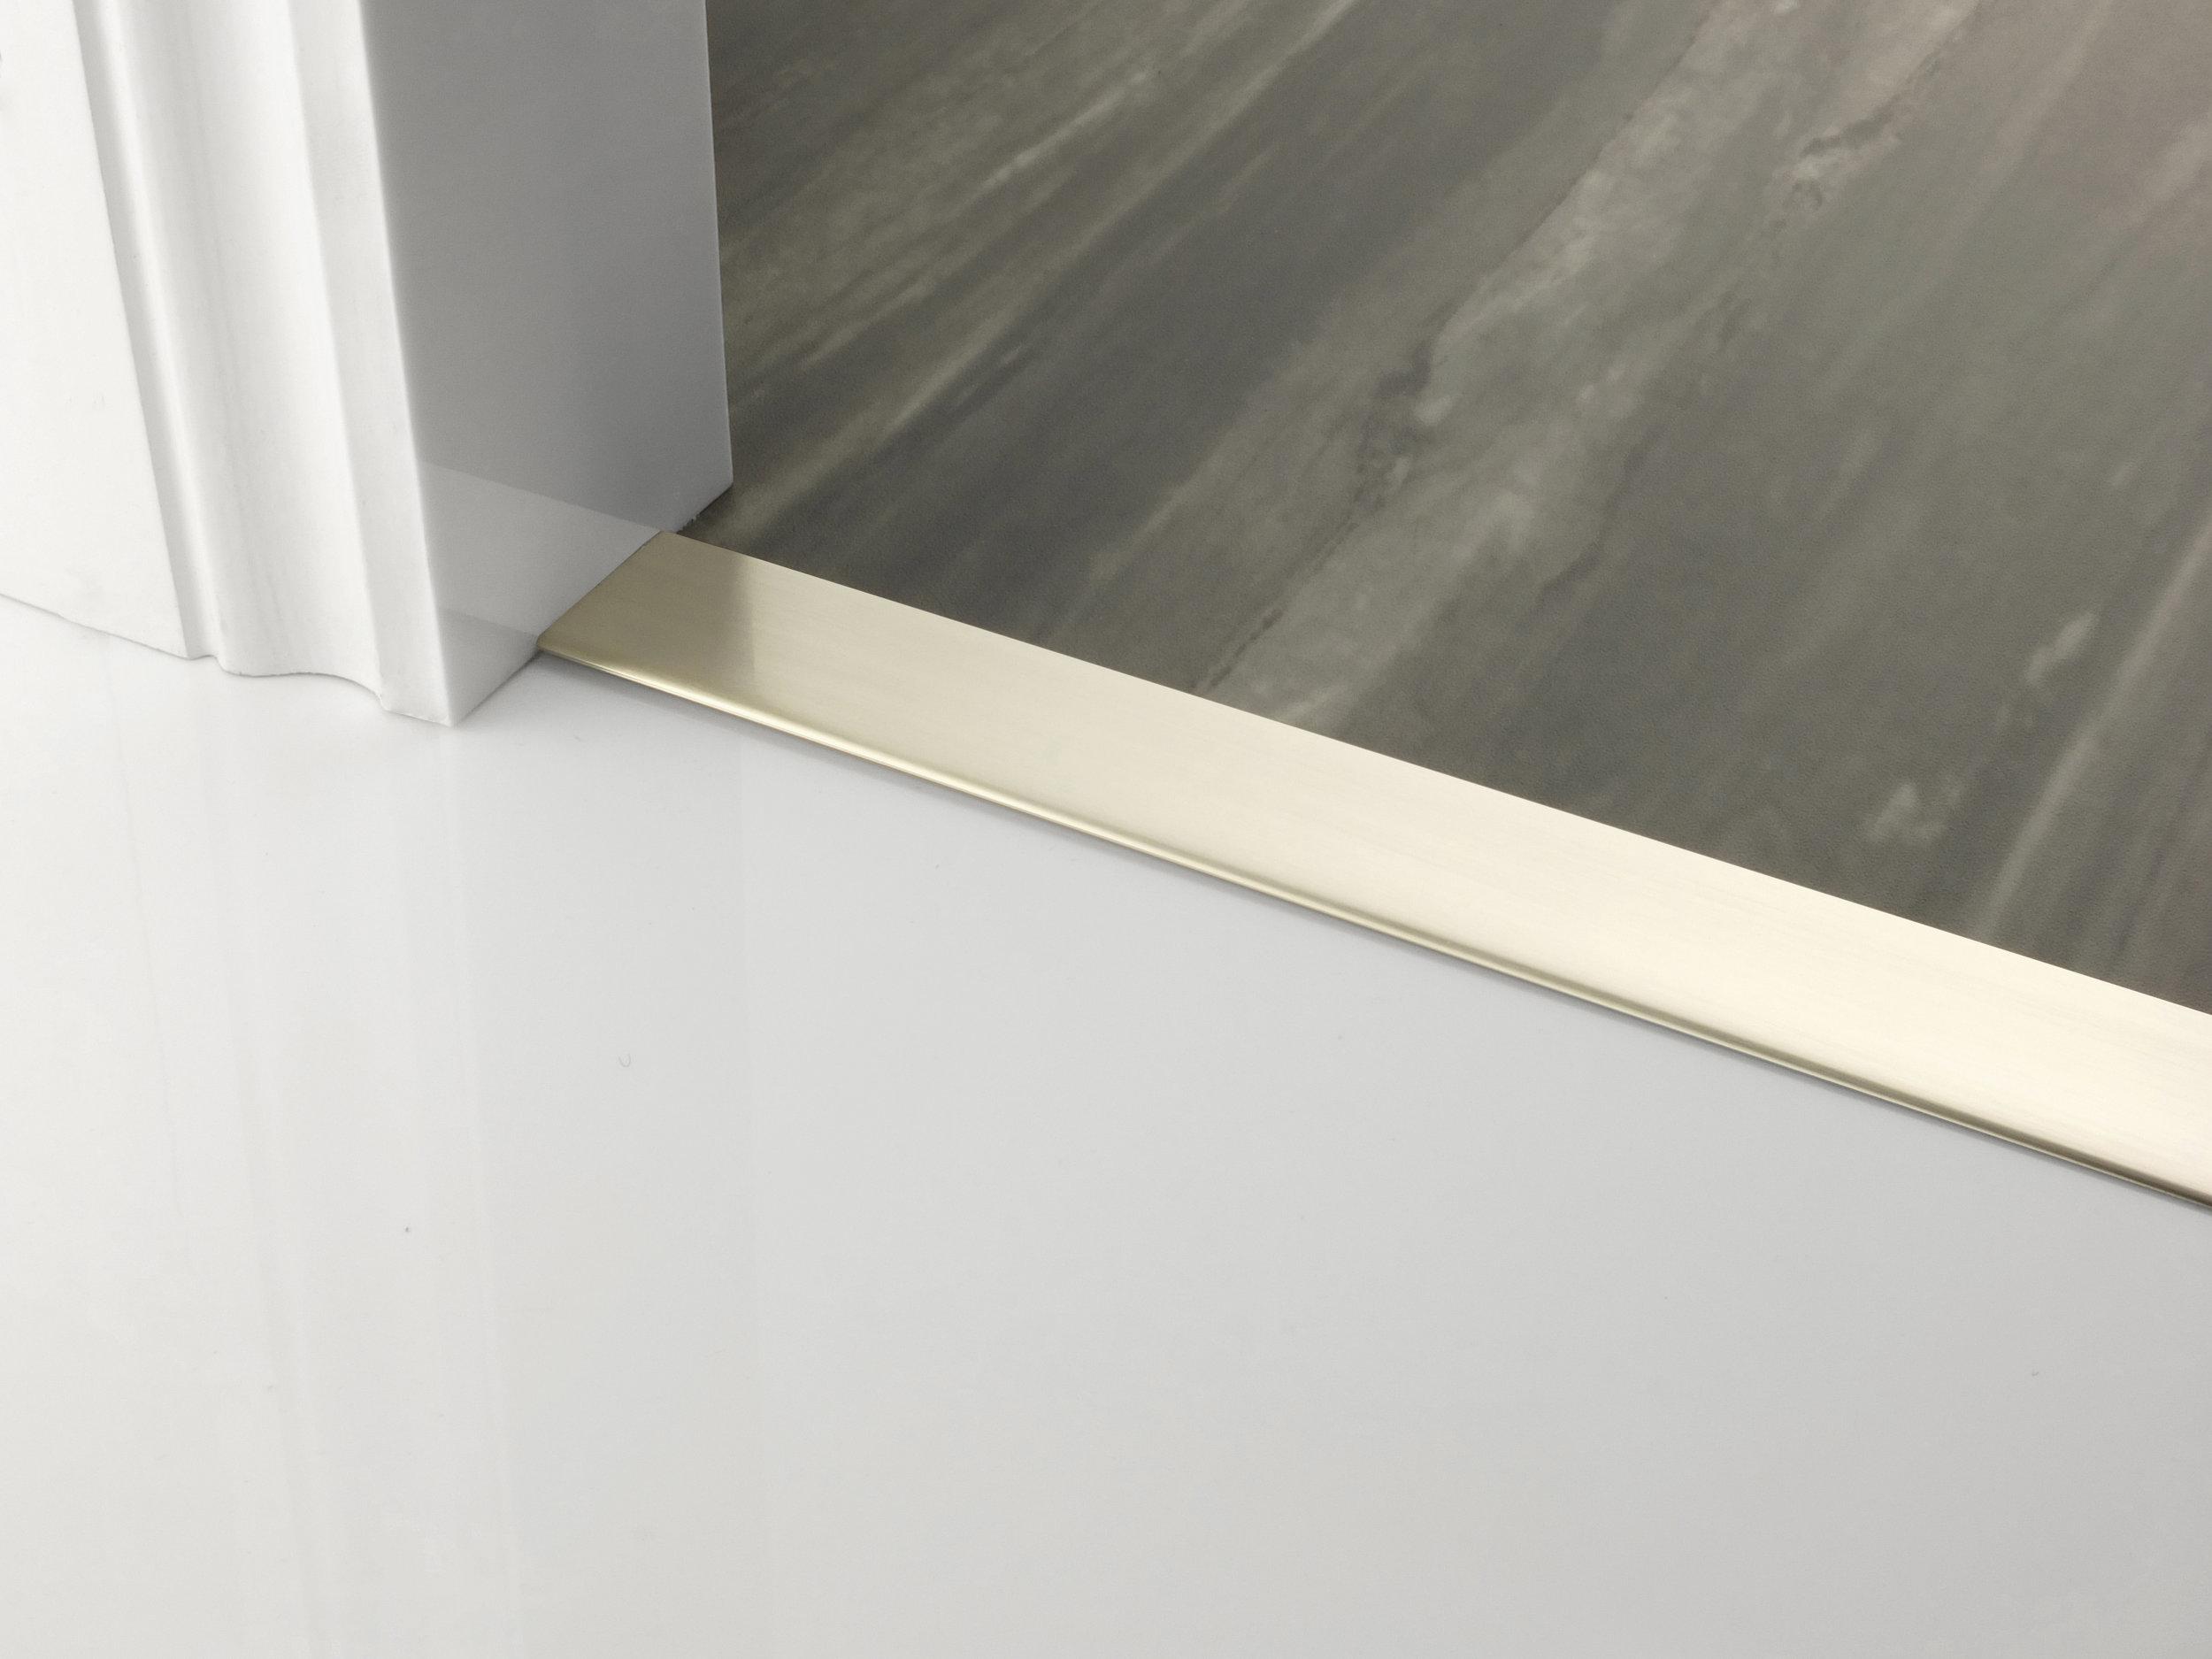 door_bar_floating_cover-40mm_satin_nickel.jpg